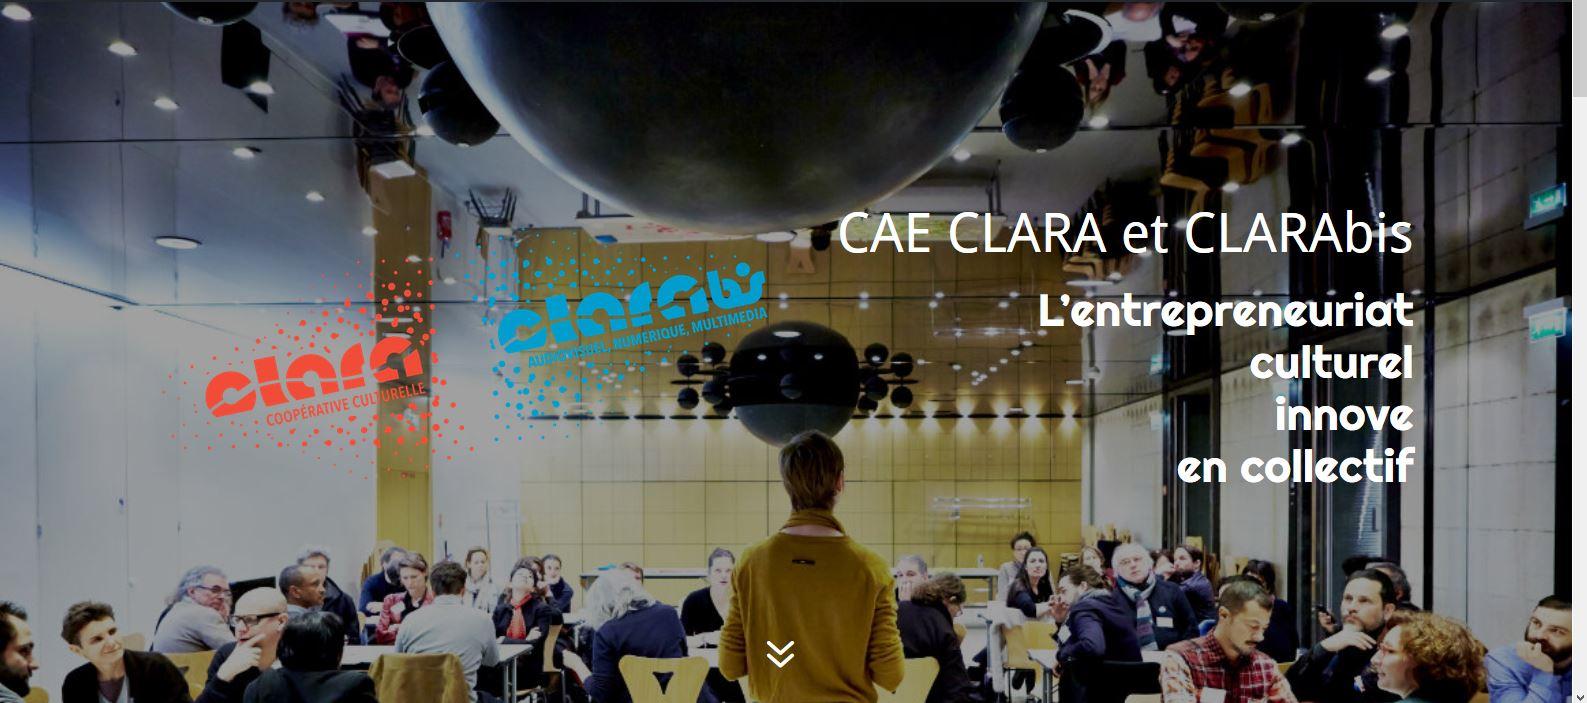 (c) Cae-clara.fr